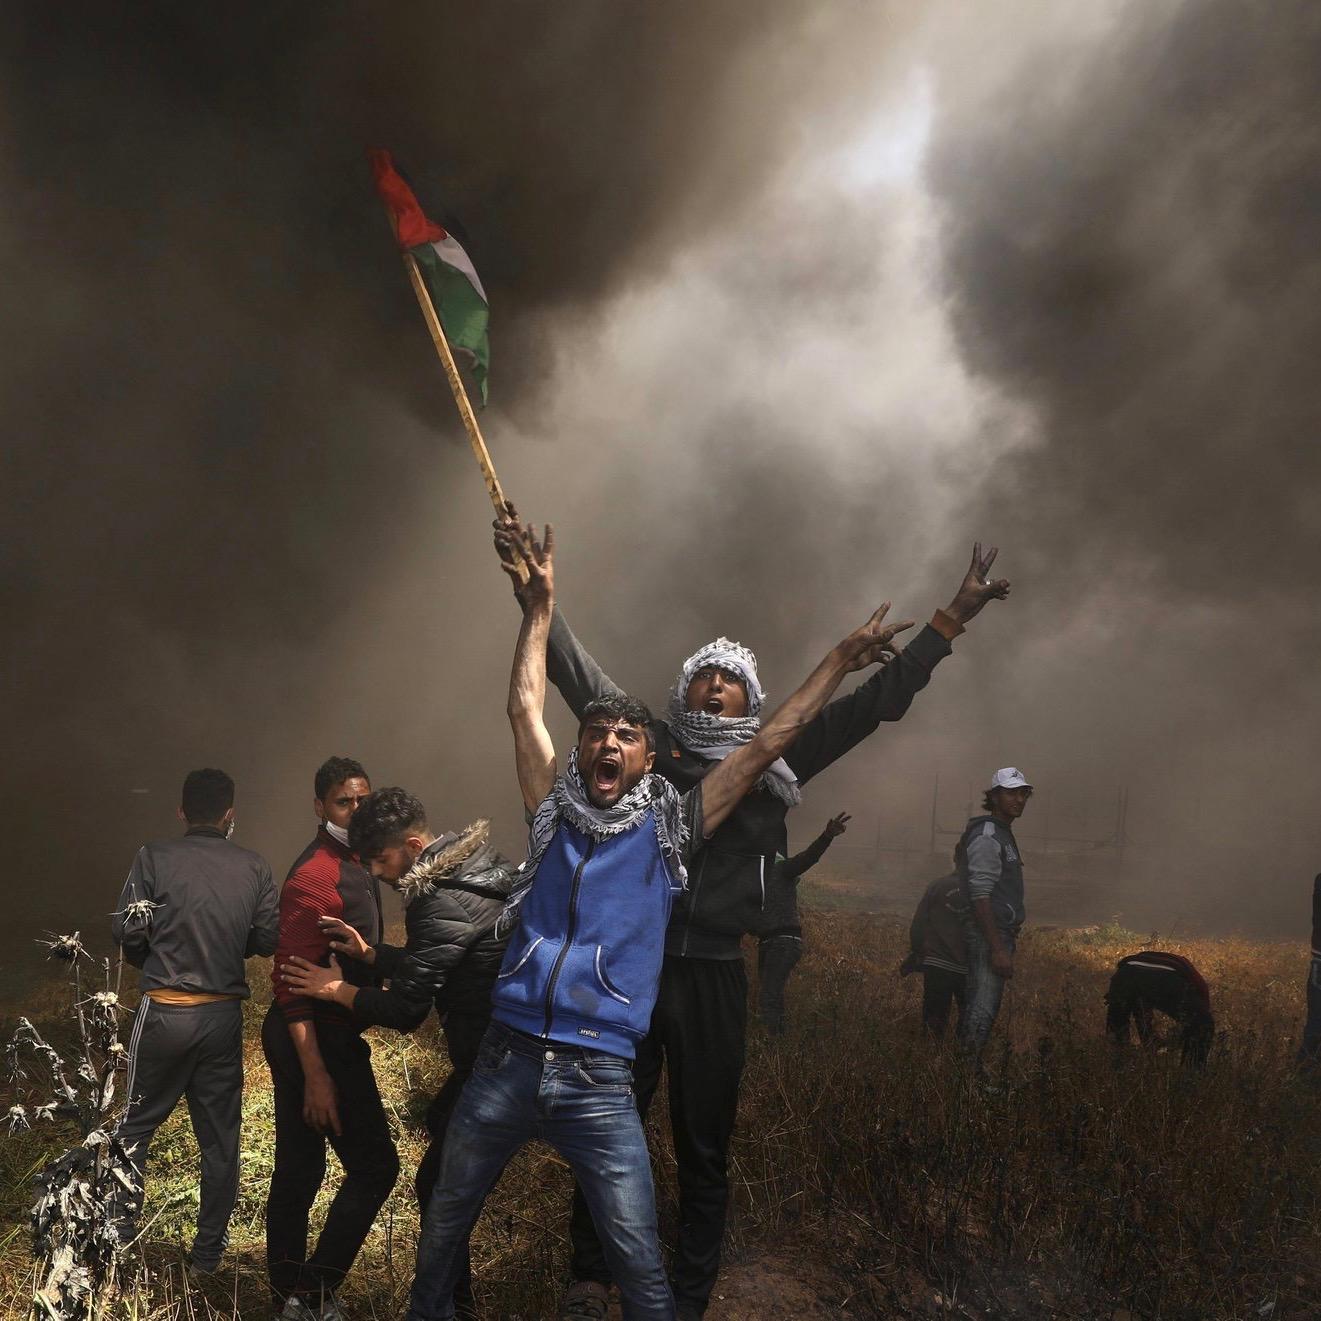 Peaceful Palestinians Deploy Molotov Kites At Gaza Strip, IDF Responds [VIDEO]